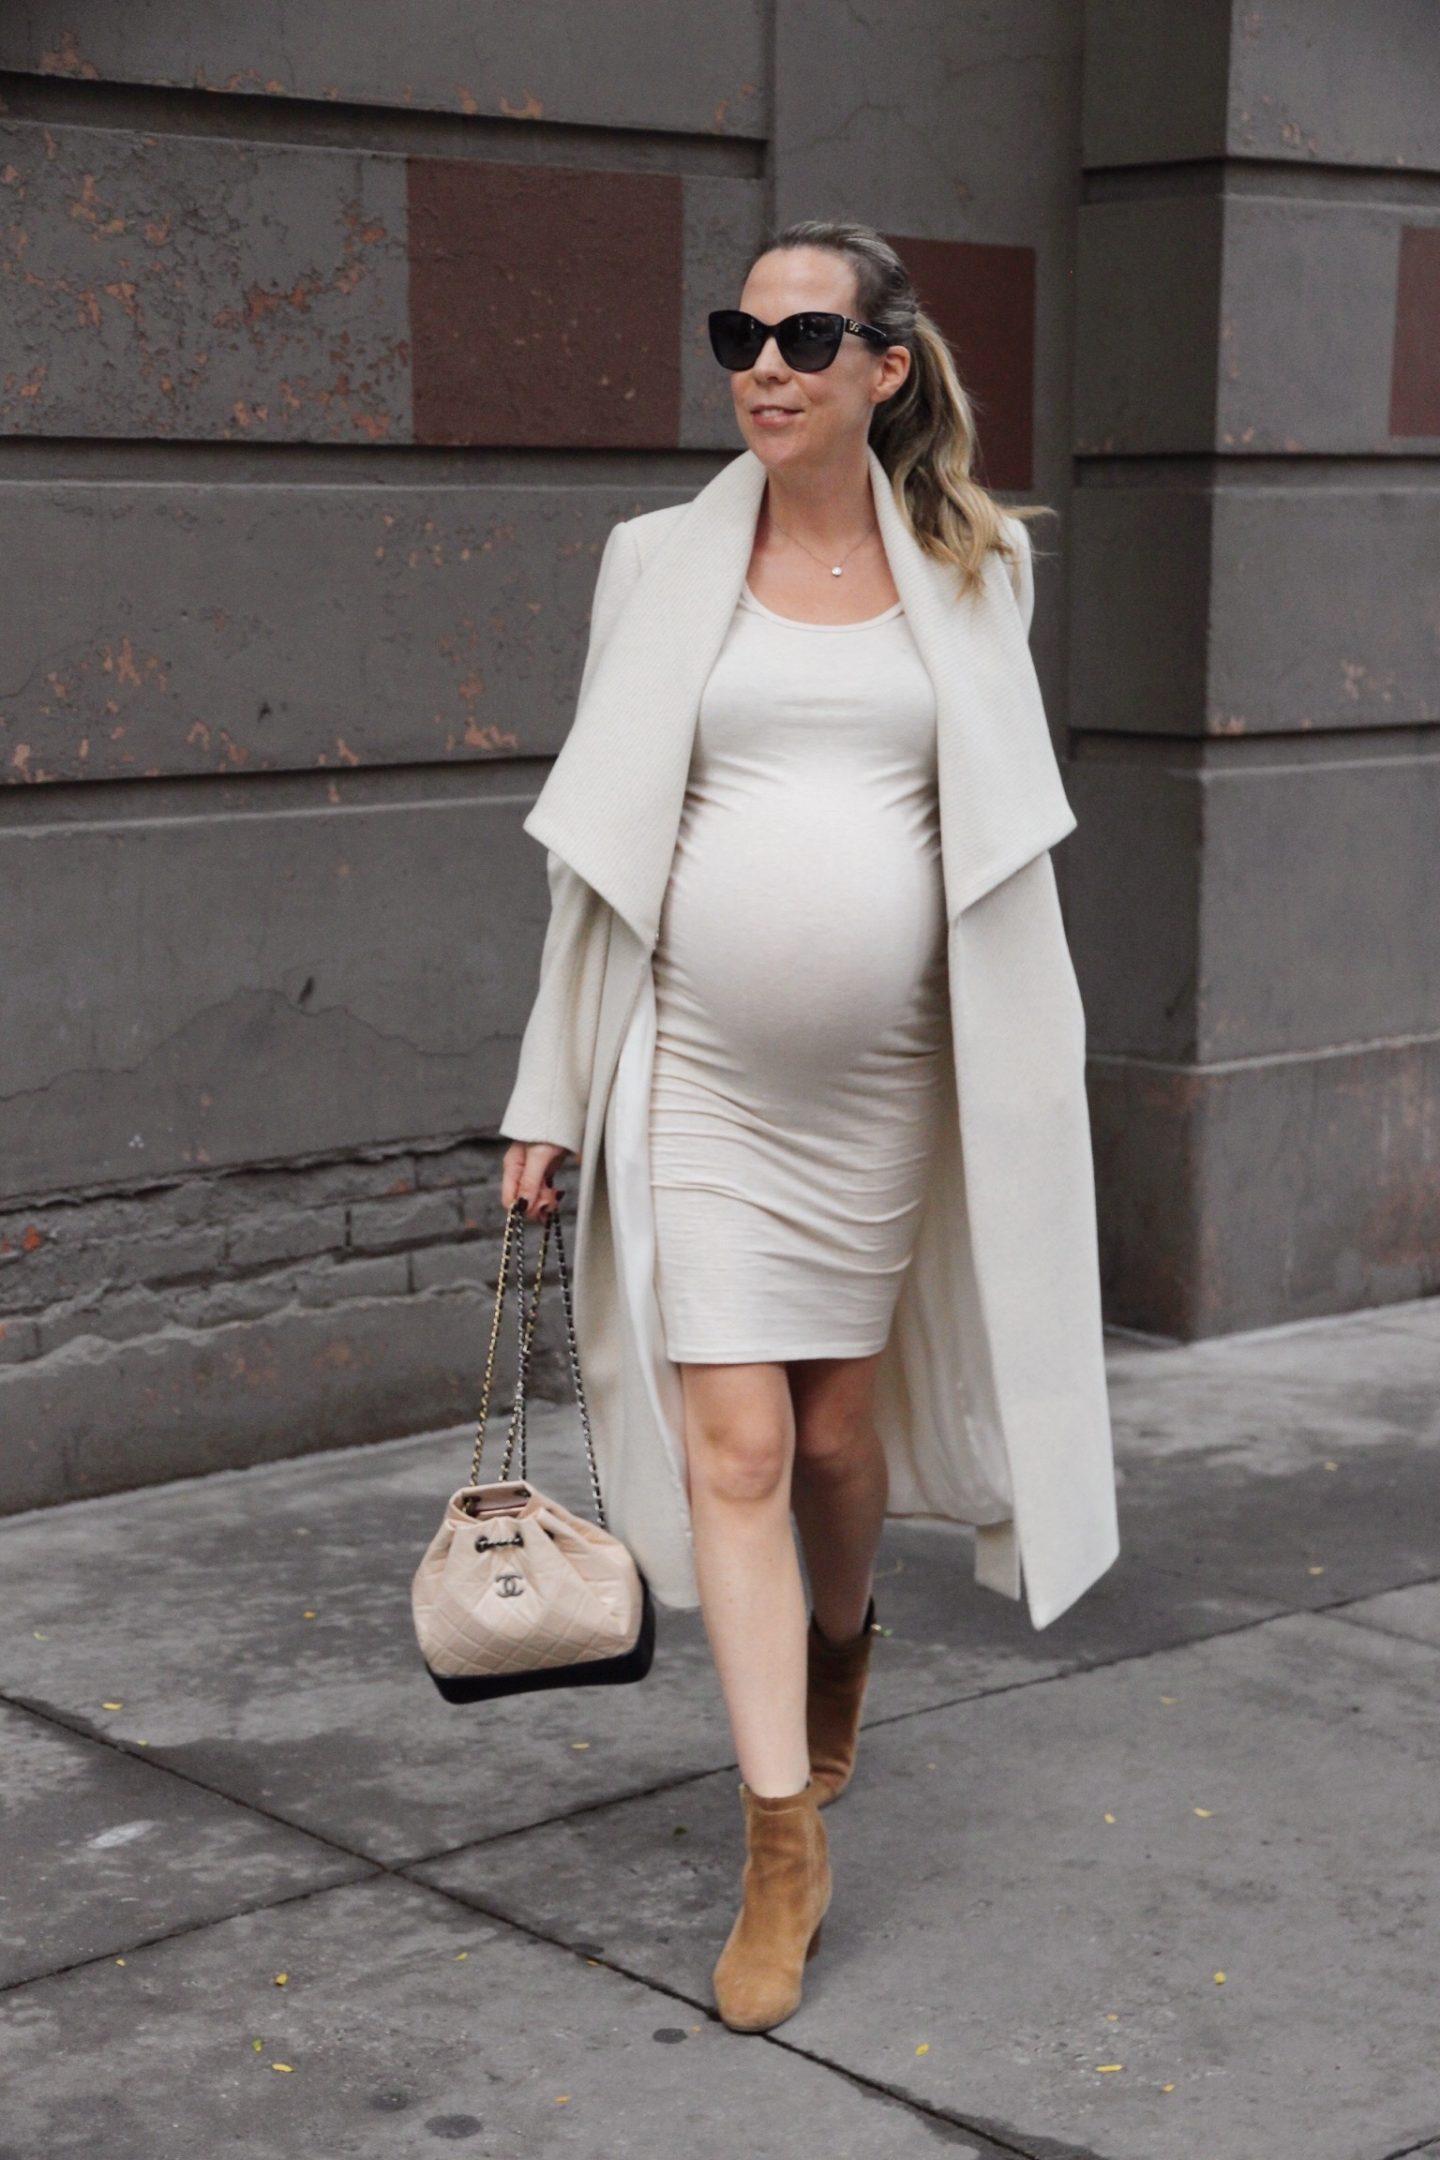 Lisa Morgan Maternity Stylist Maternity Fashion